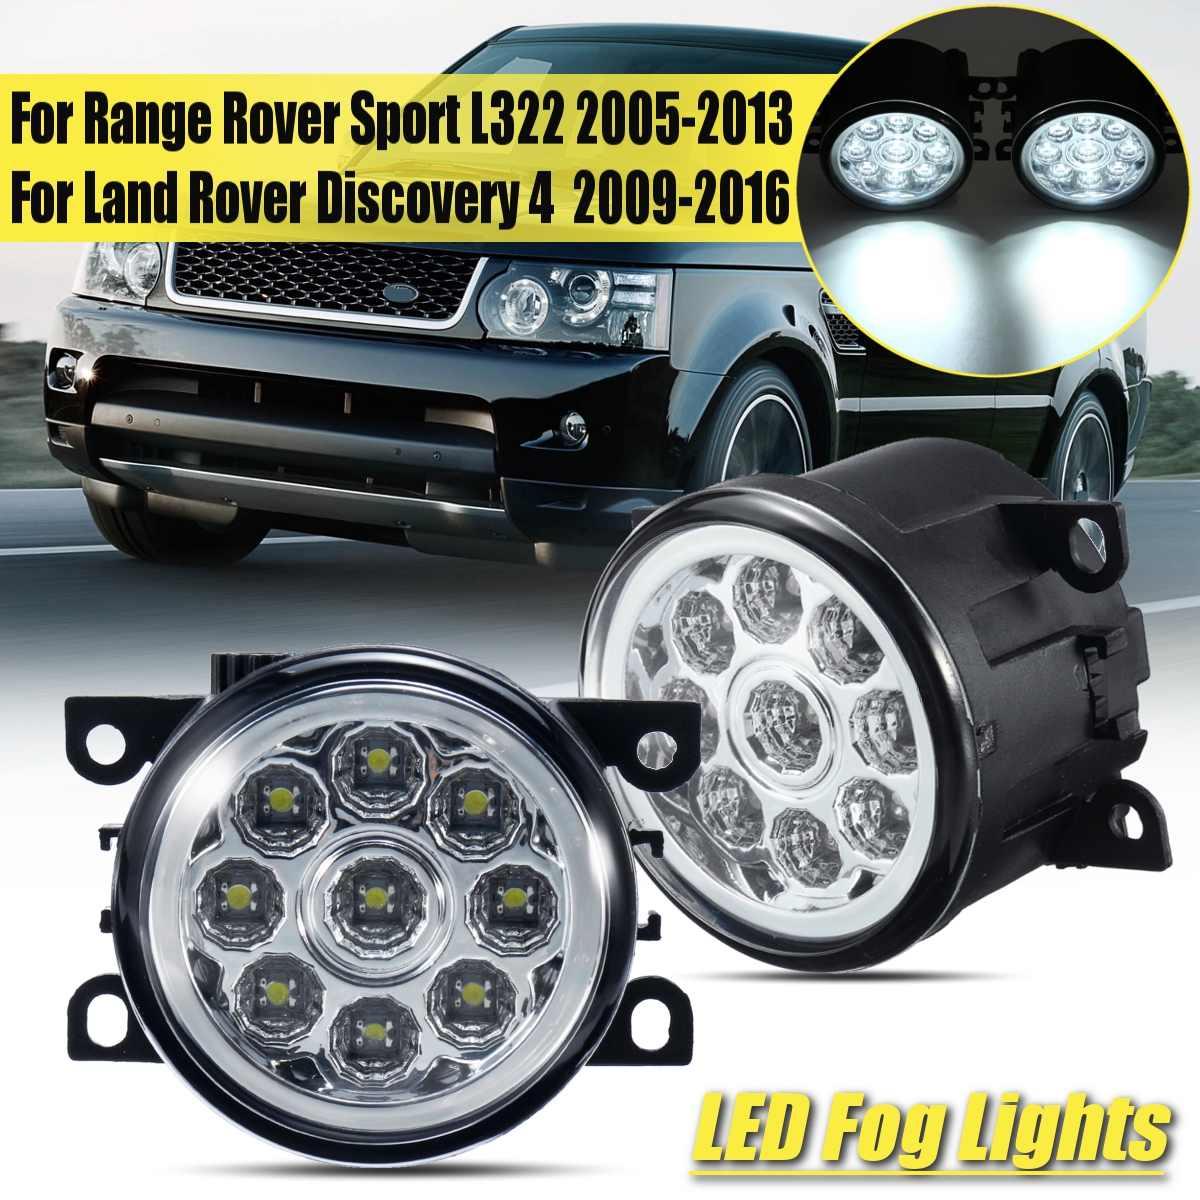 2Pcs Front 12V Led Fog Light For Range Rover Sport L322 2005-2013 Discovery 4 2009-2016 Land Rover Drl Bumper Foglights Origin